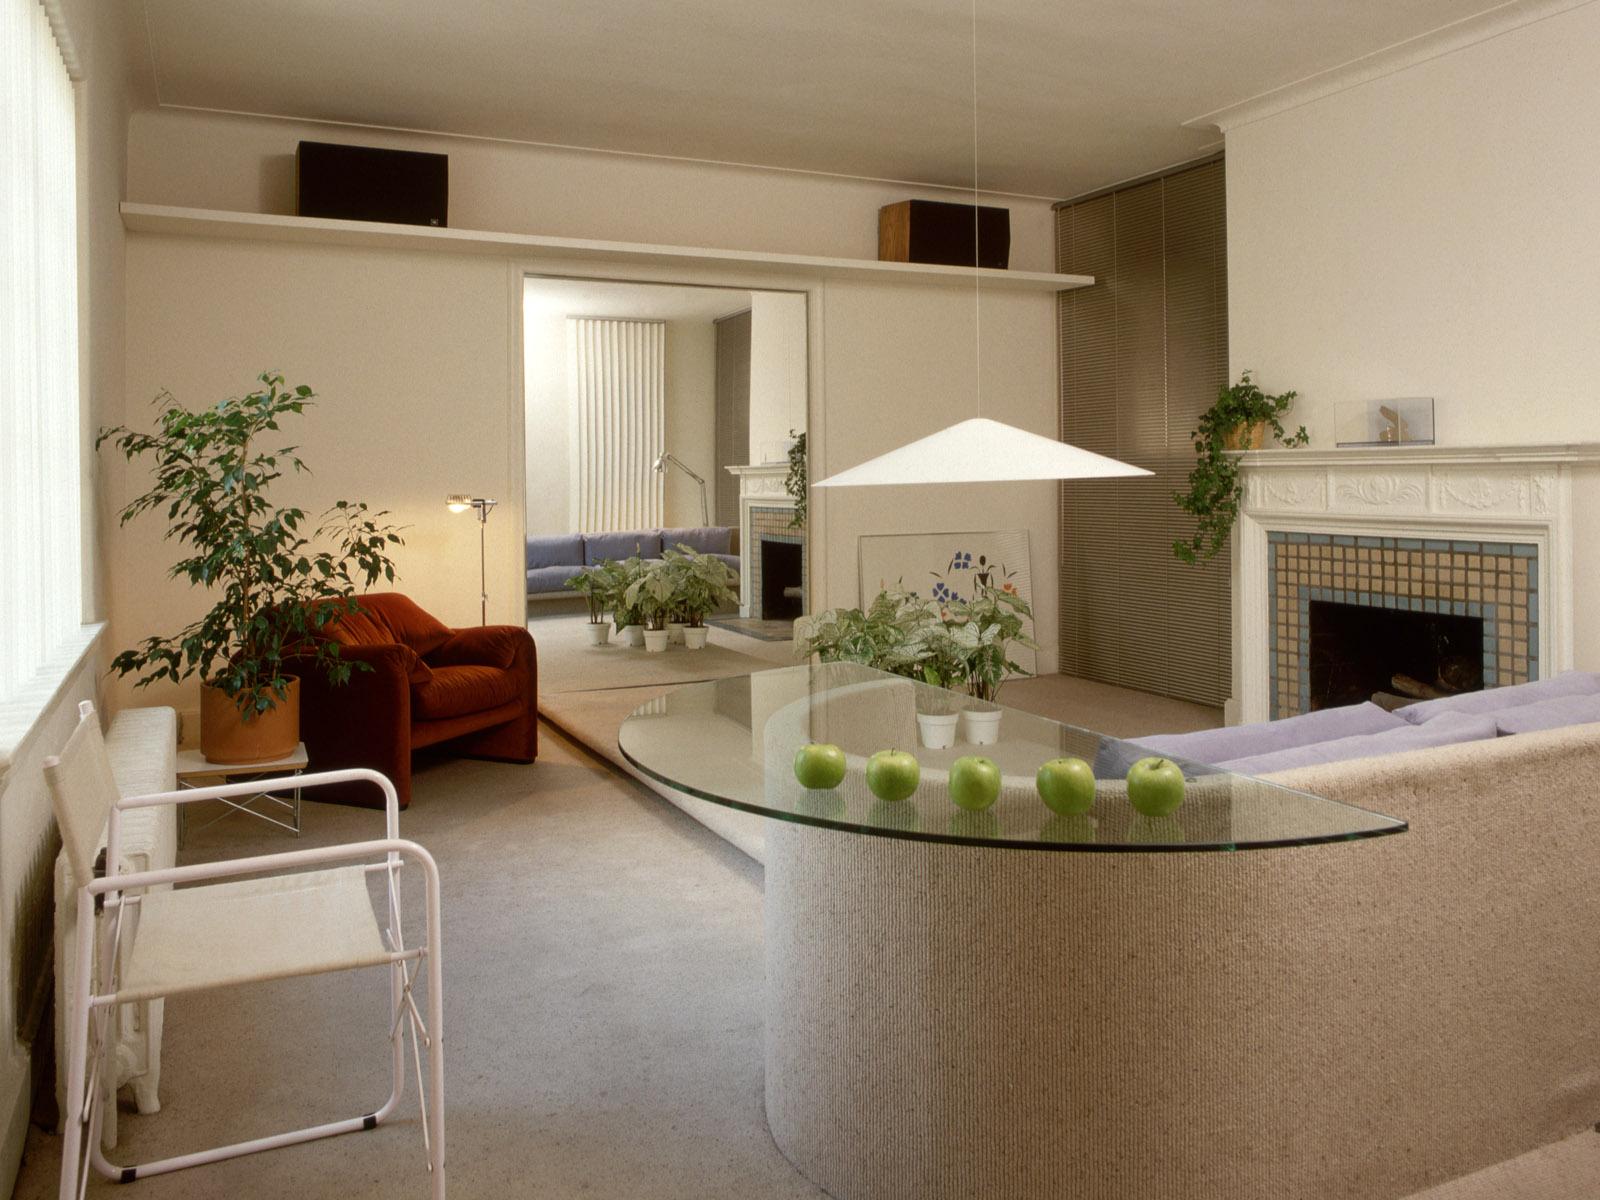 interior design wallpapersinterior design gamesinterior design 1600x1200